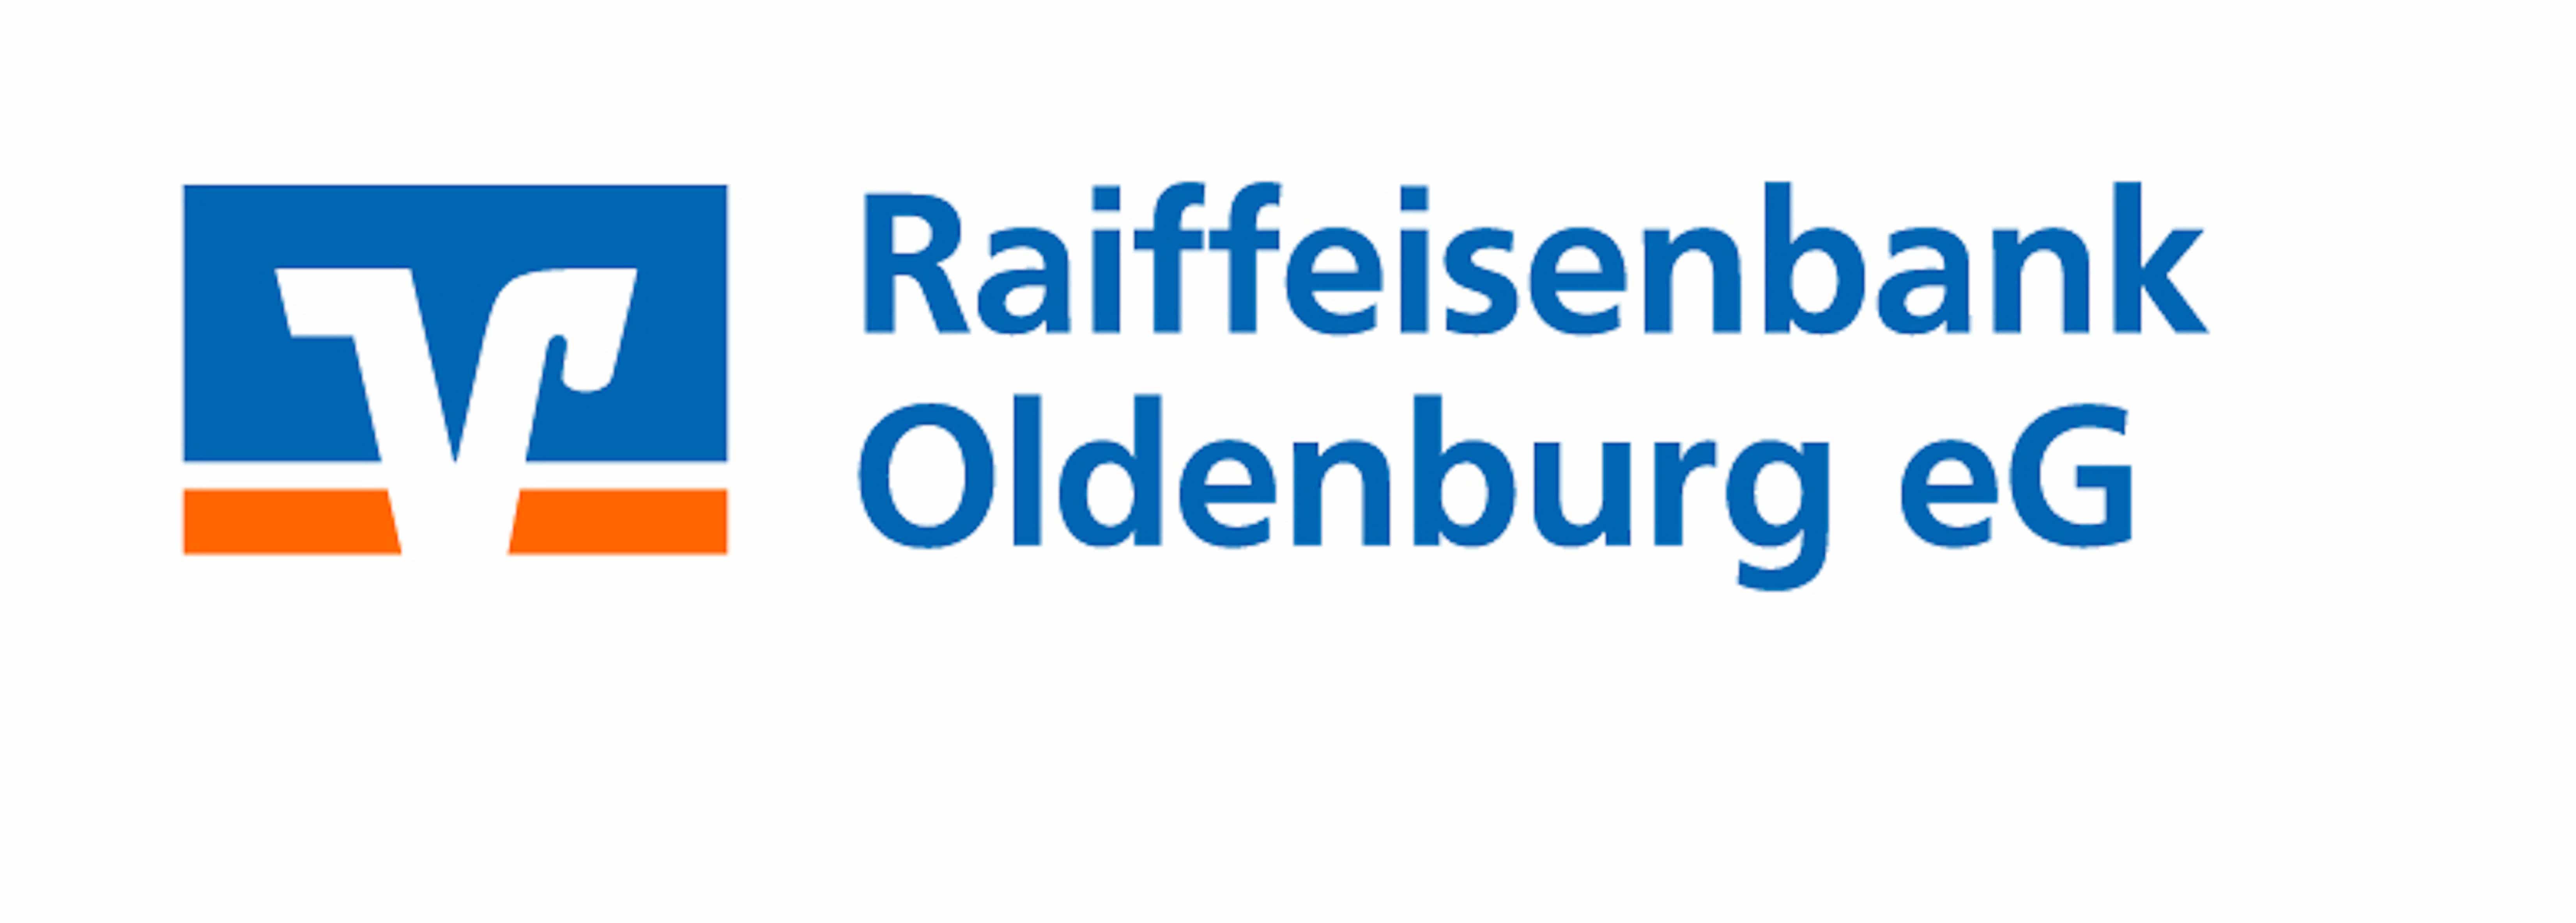 Logo_Raiffeisenbank_Oldenburg_eG_RGB_600 dpi 6608x2367